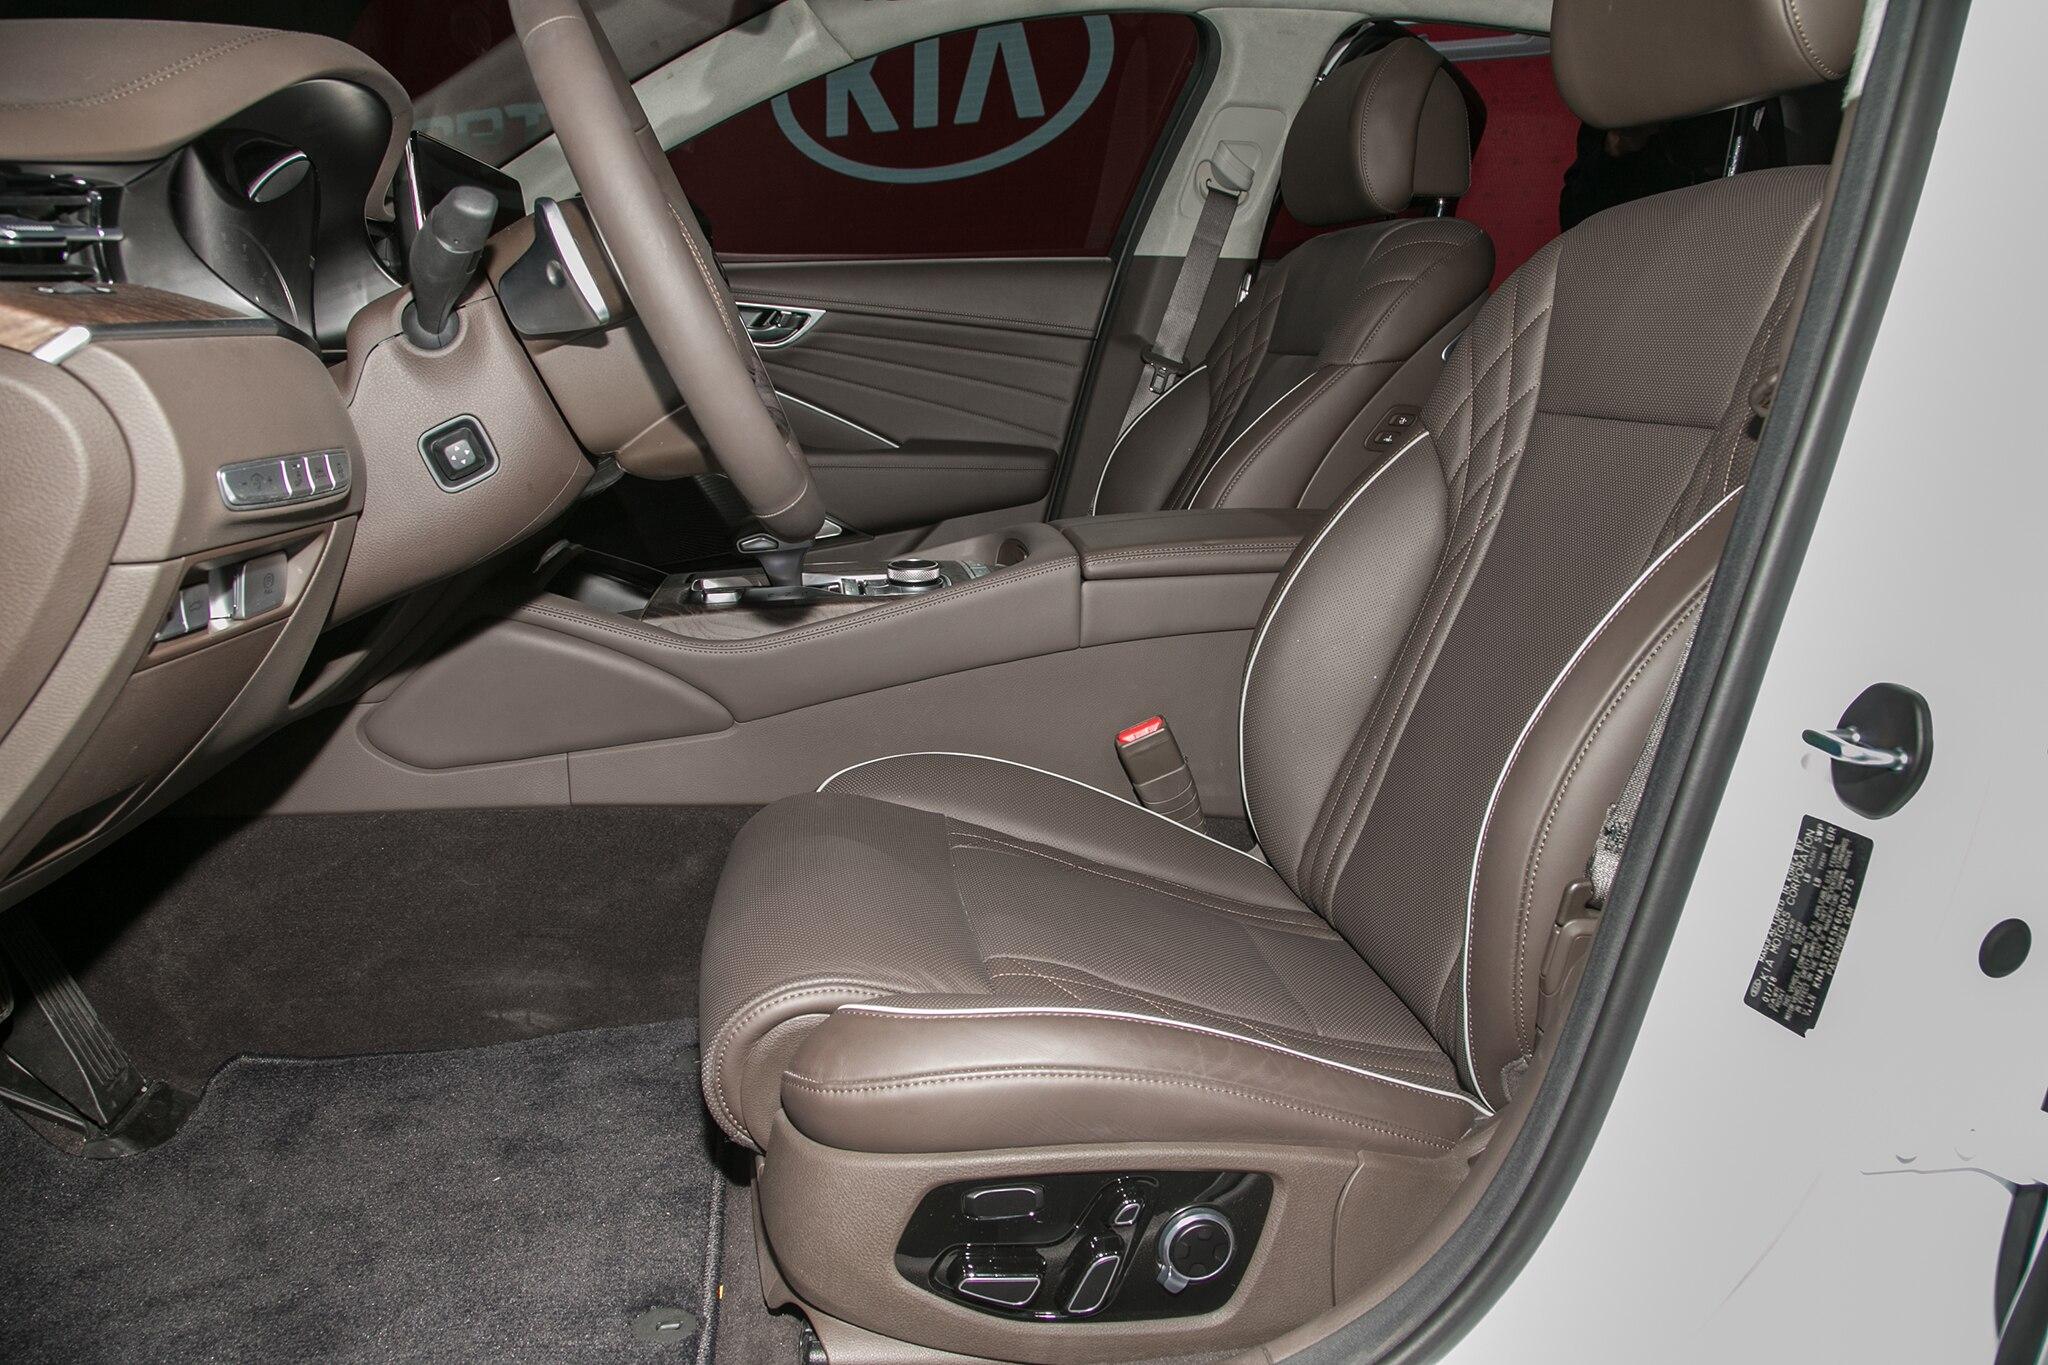 the kia ramps up york roadshow new luxury cost sedan news fancy